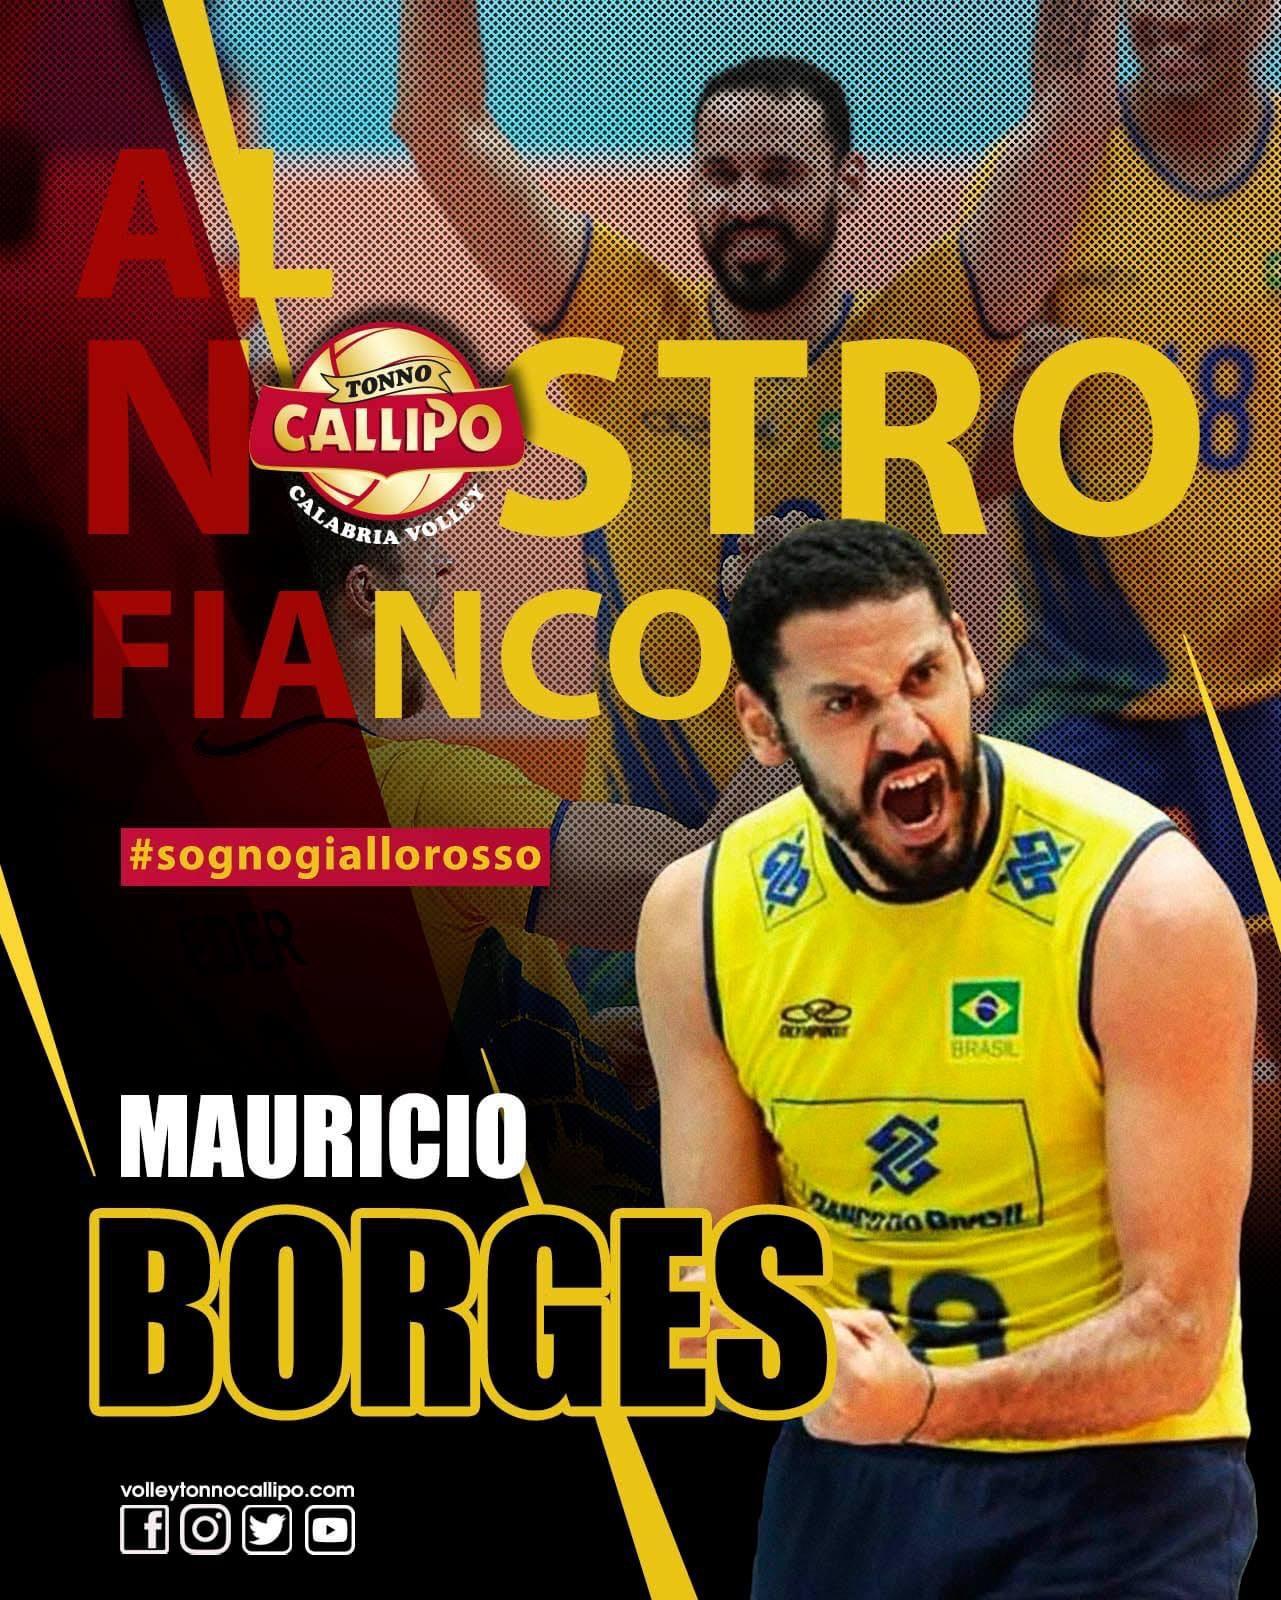 Italy: it's official! MVP of last Brazilian Superliga Maurício Borges lands in Vibo